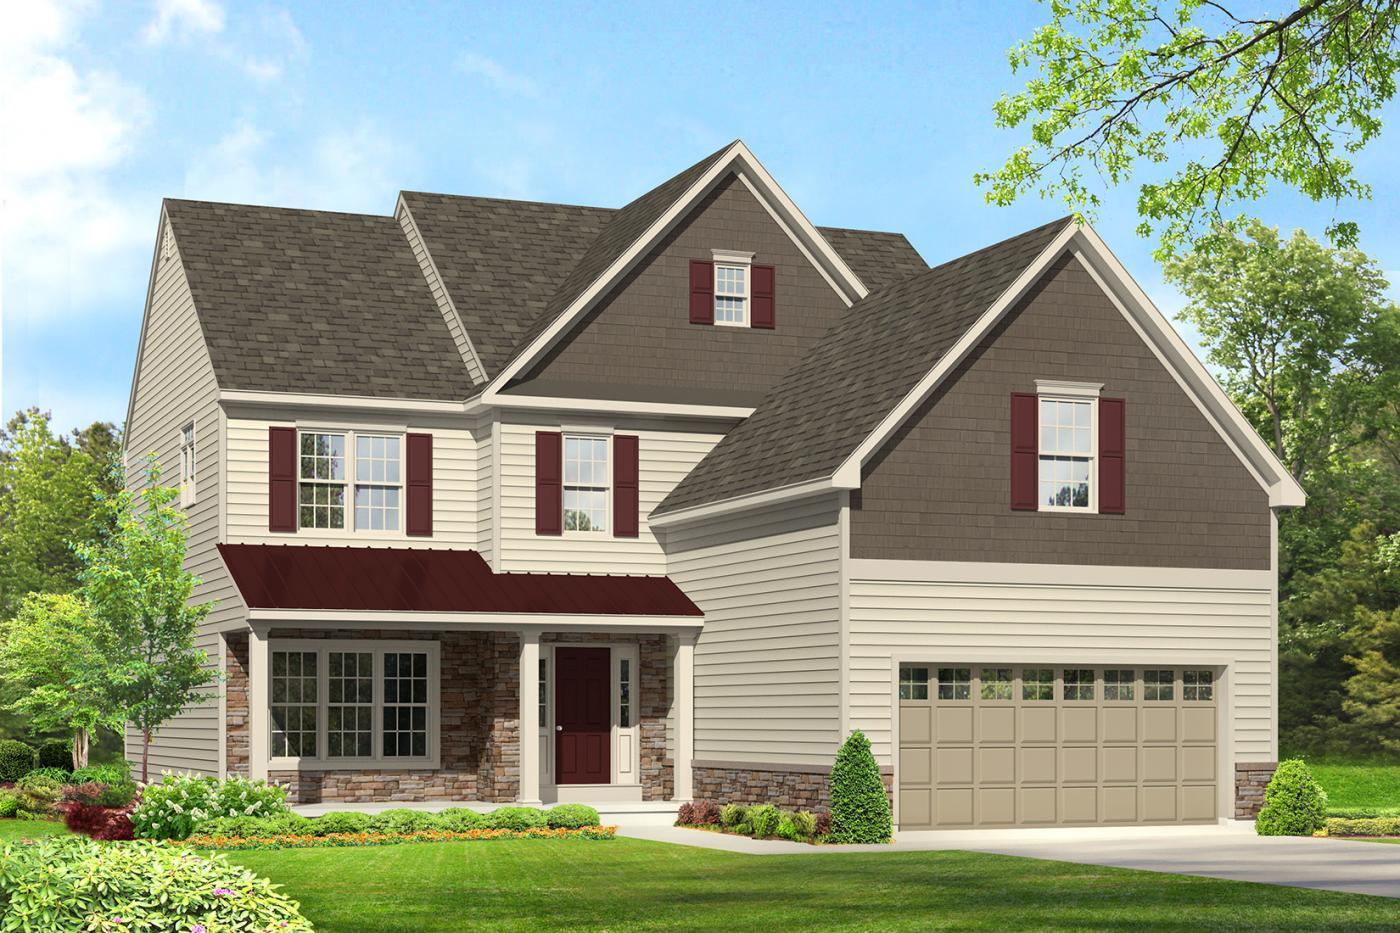 Single Family for Sale at Maple Shade Estates (Bethlehem Twp) - Sherwood Grande 3796 Bethman Road Easton, Pennsylvania 18045 United States